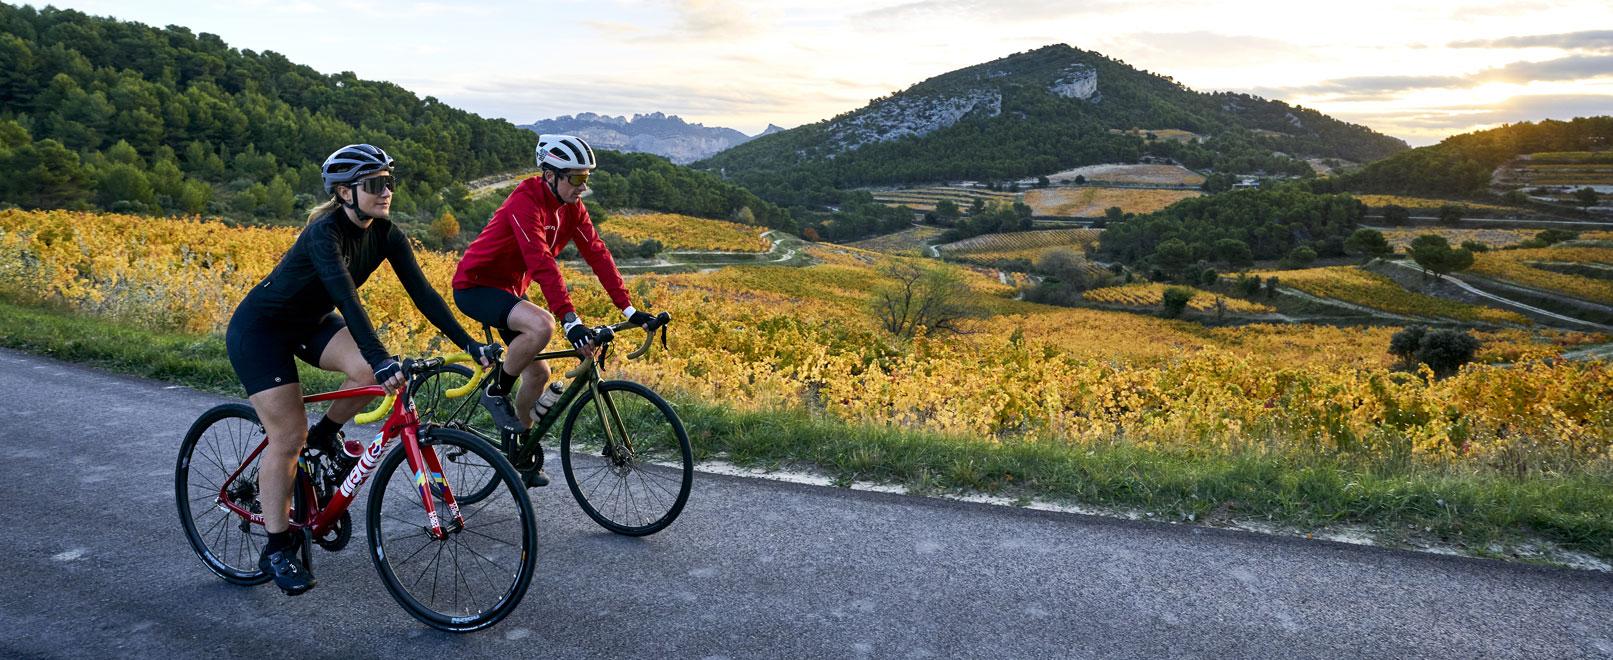 Vineyards and bikes: A Di-VINE duo!